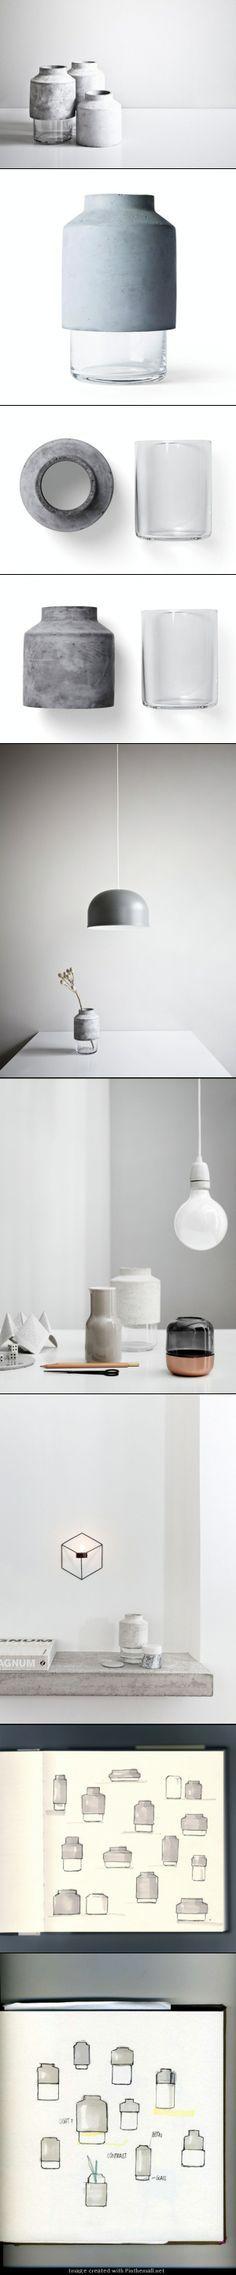 Concrete vase | Concrete product design | Cement | WIllman design | Beton design | Betonlook | www.forbo.com/eurocol/nl-nl?utm_content=buffer4e803&utm_medium=social&utm_source=pinterest.com&utm_campaign=buffer